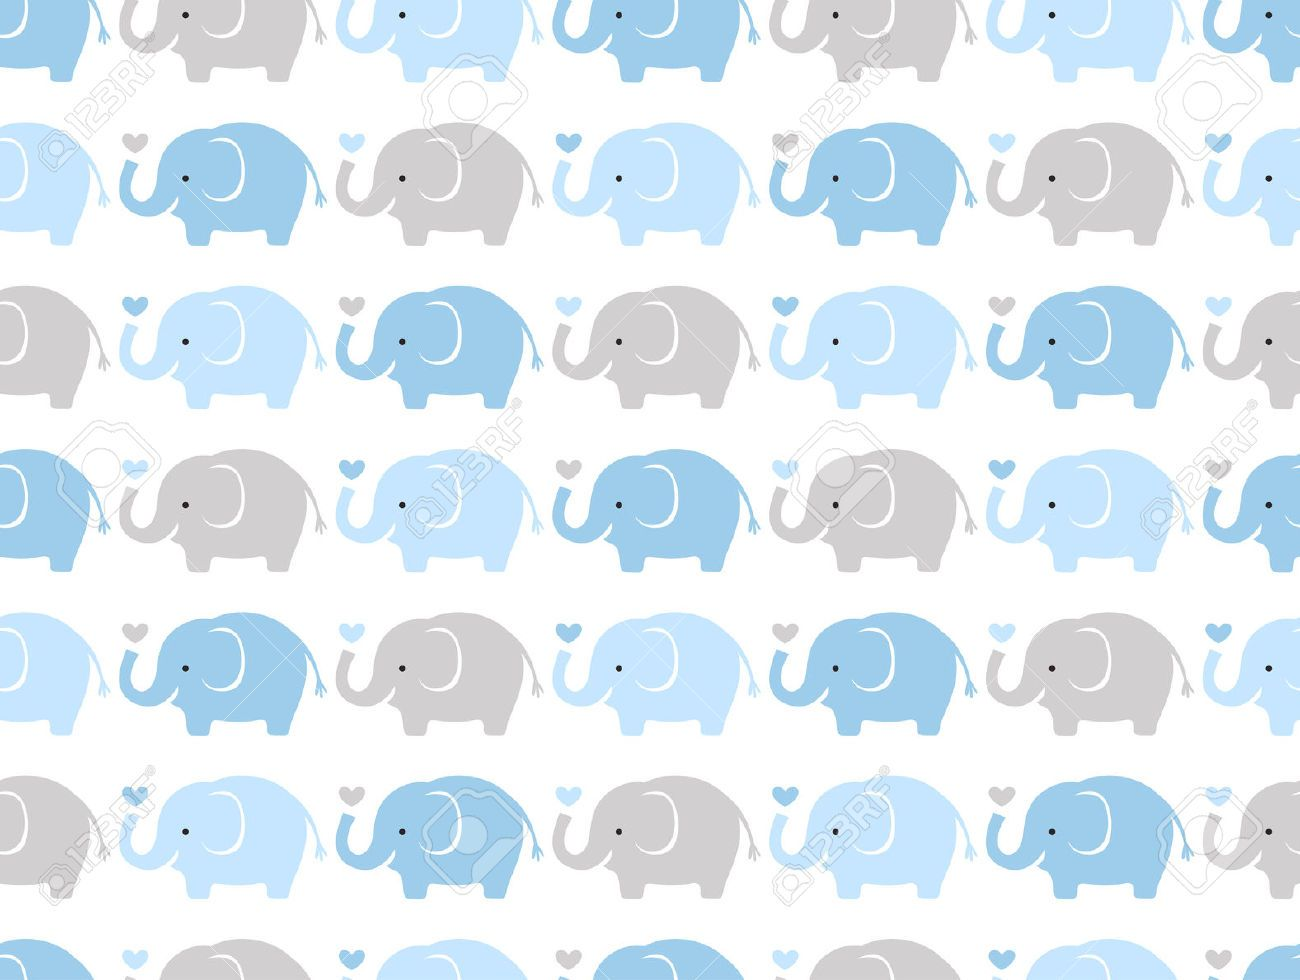 Cartoon Elephant Wallpapers Top Free Cartoon Elephant